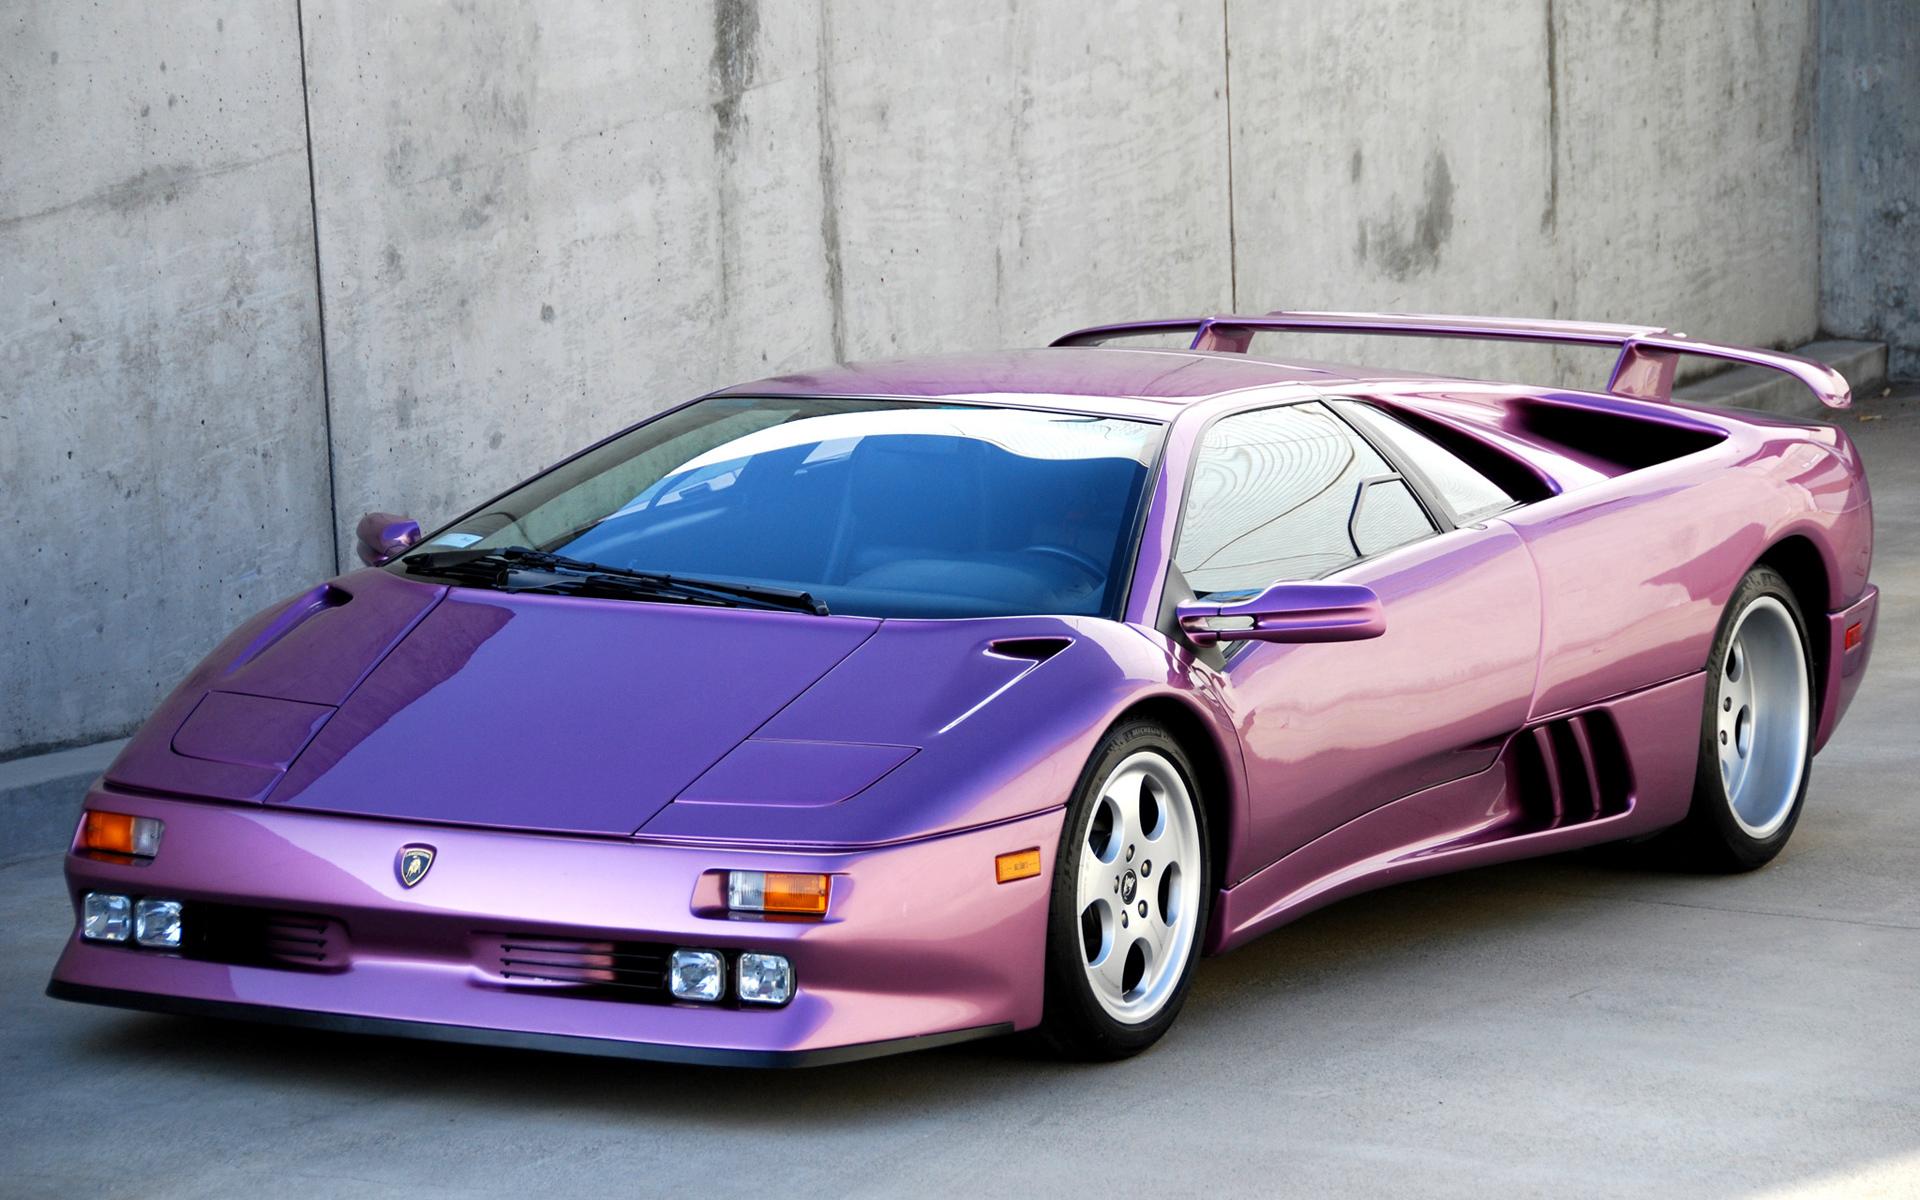 Purple Lamborghini Wallpaper For Iphone